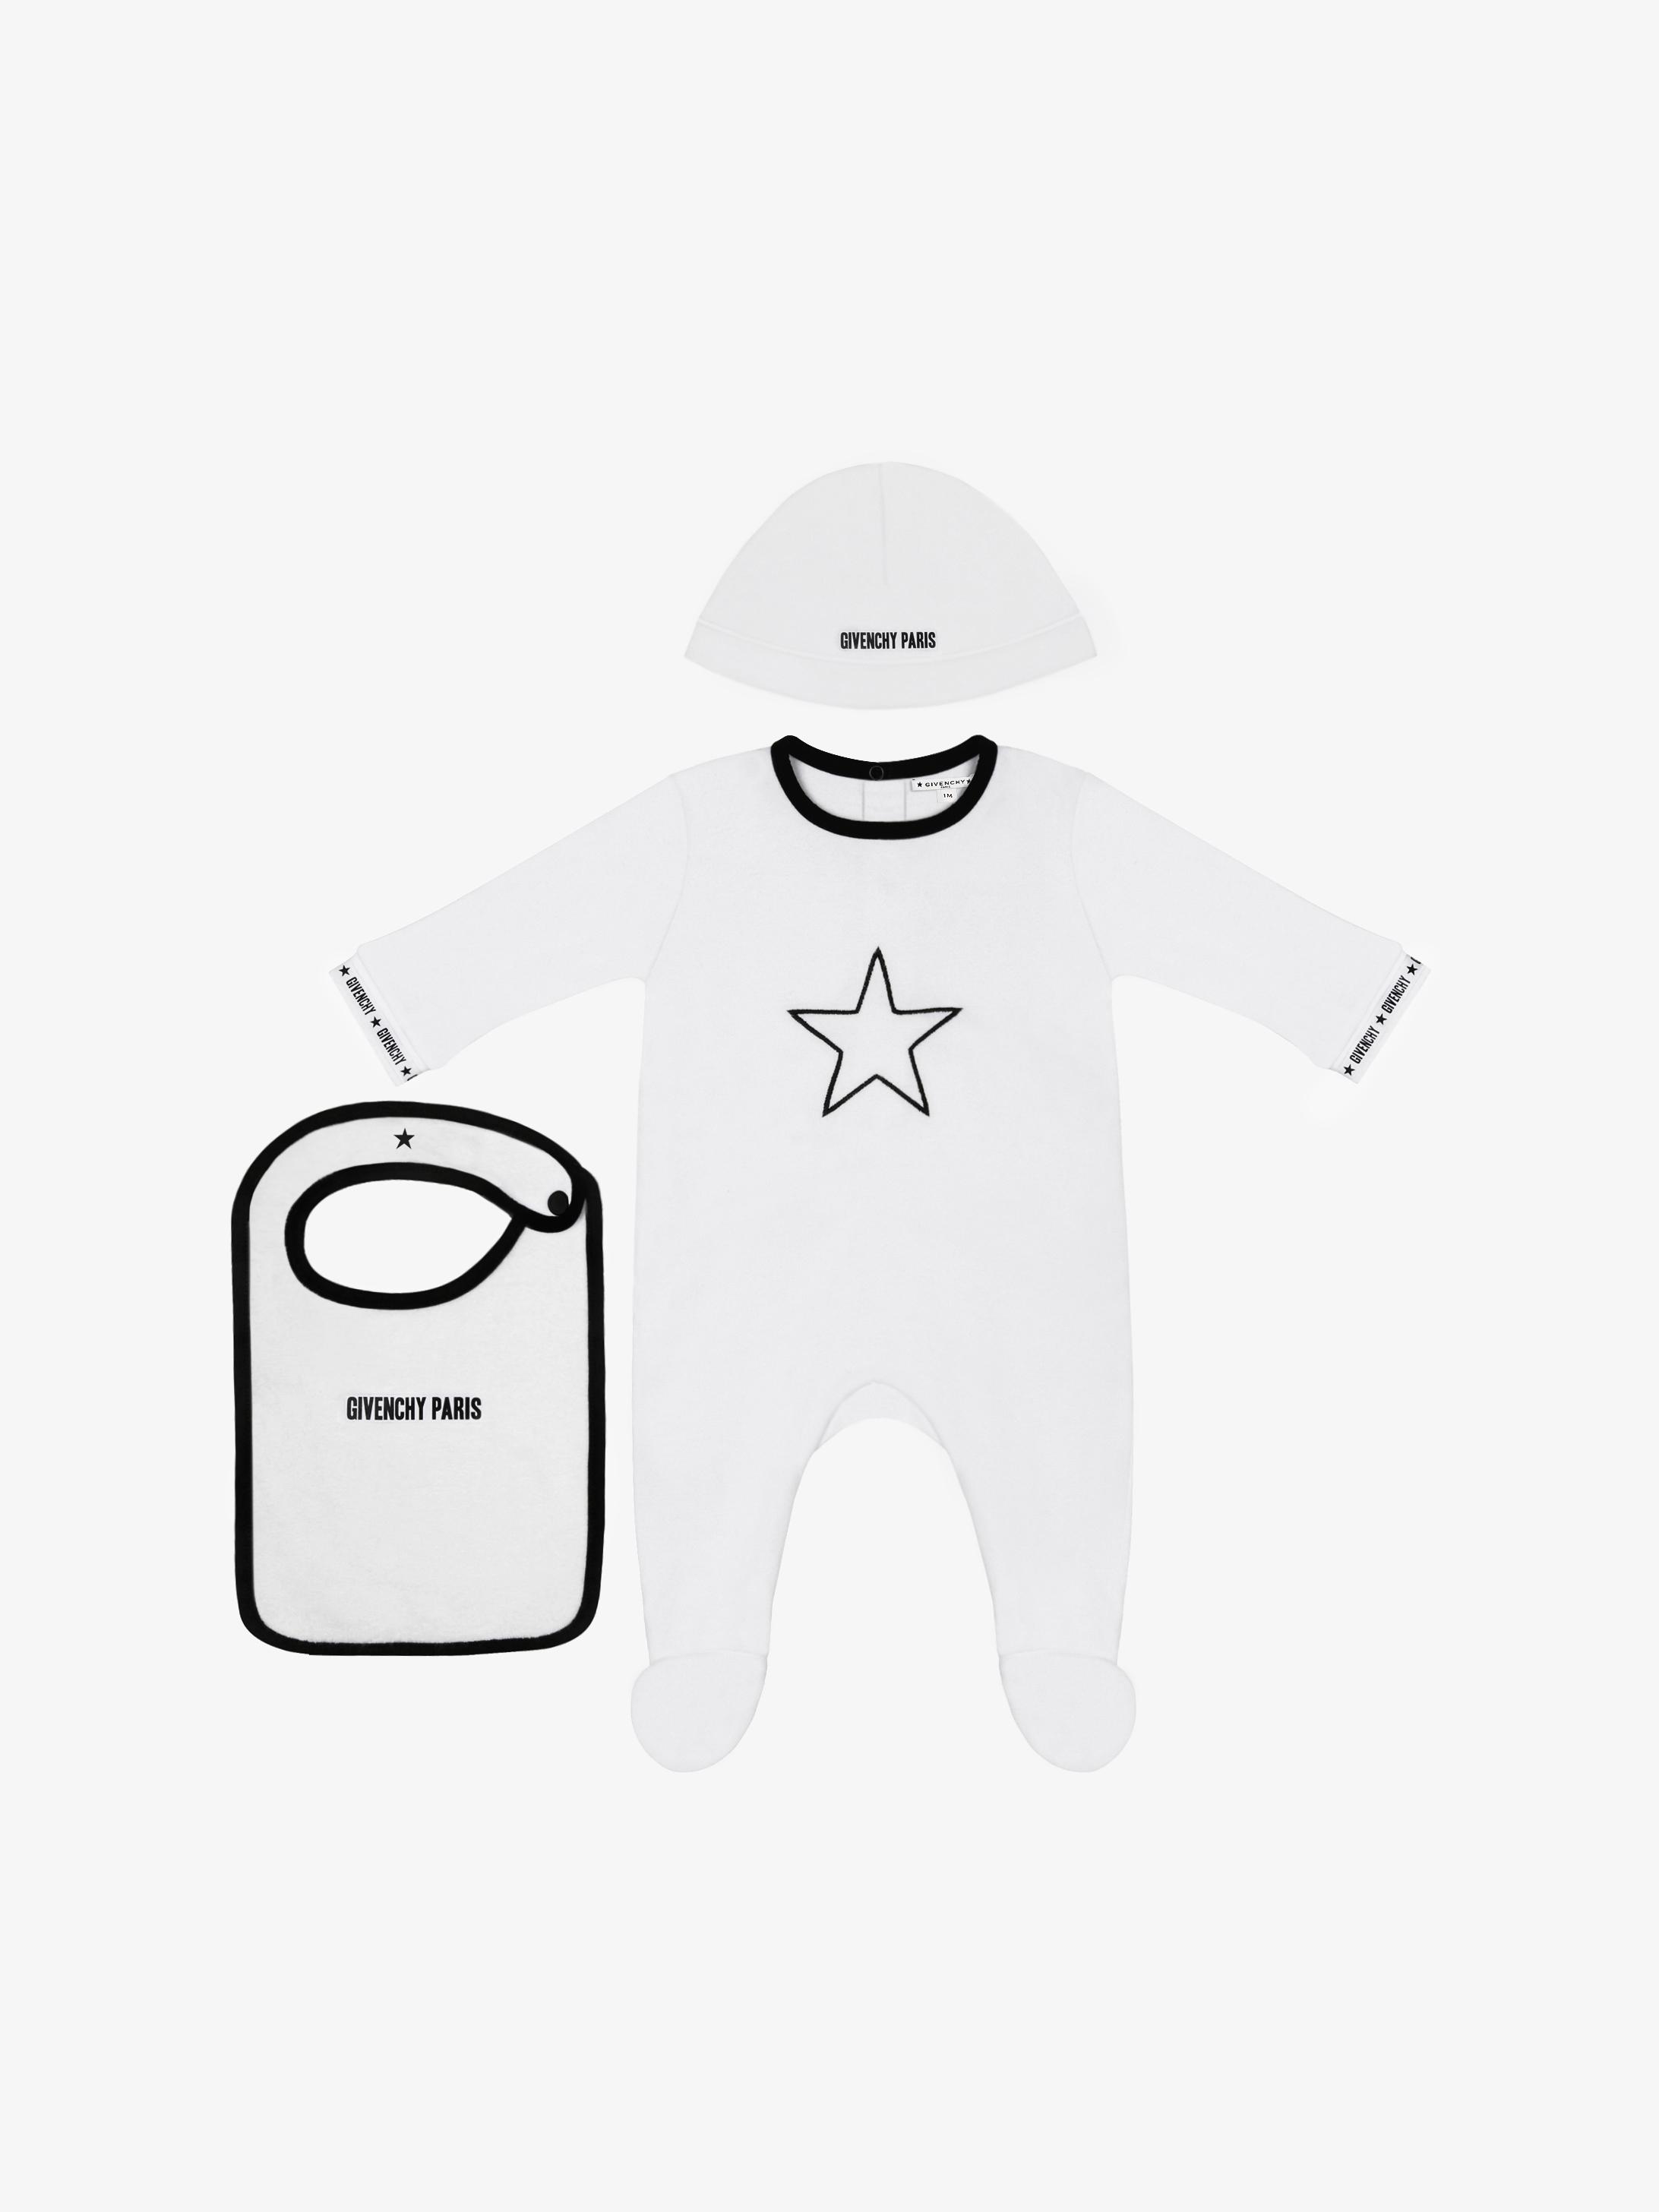 Givenchy paris logo clipart vector transparent stock Pyjamas, hat and bib gift set | GIVENCHY Paris vector transparent stock